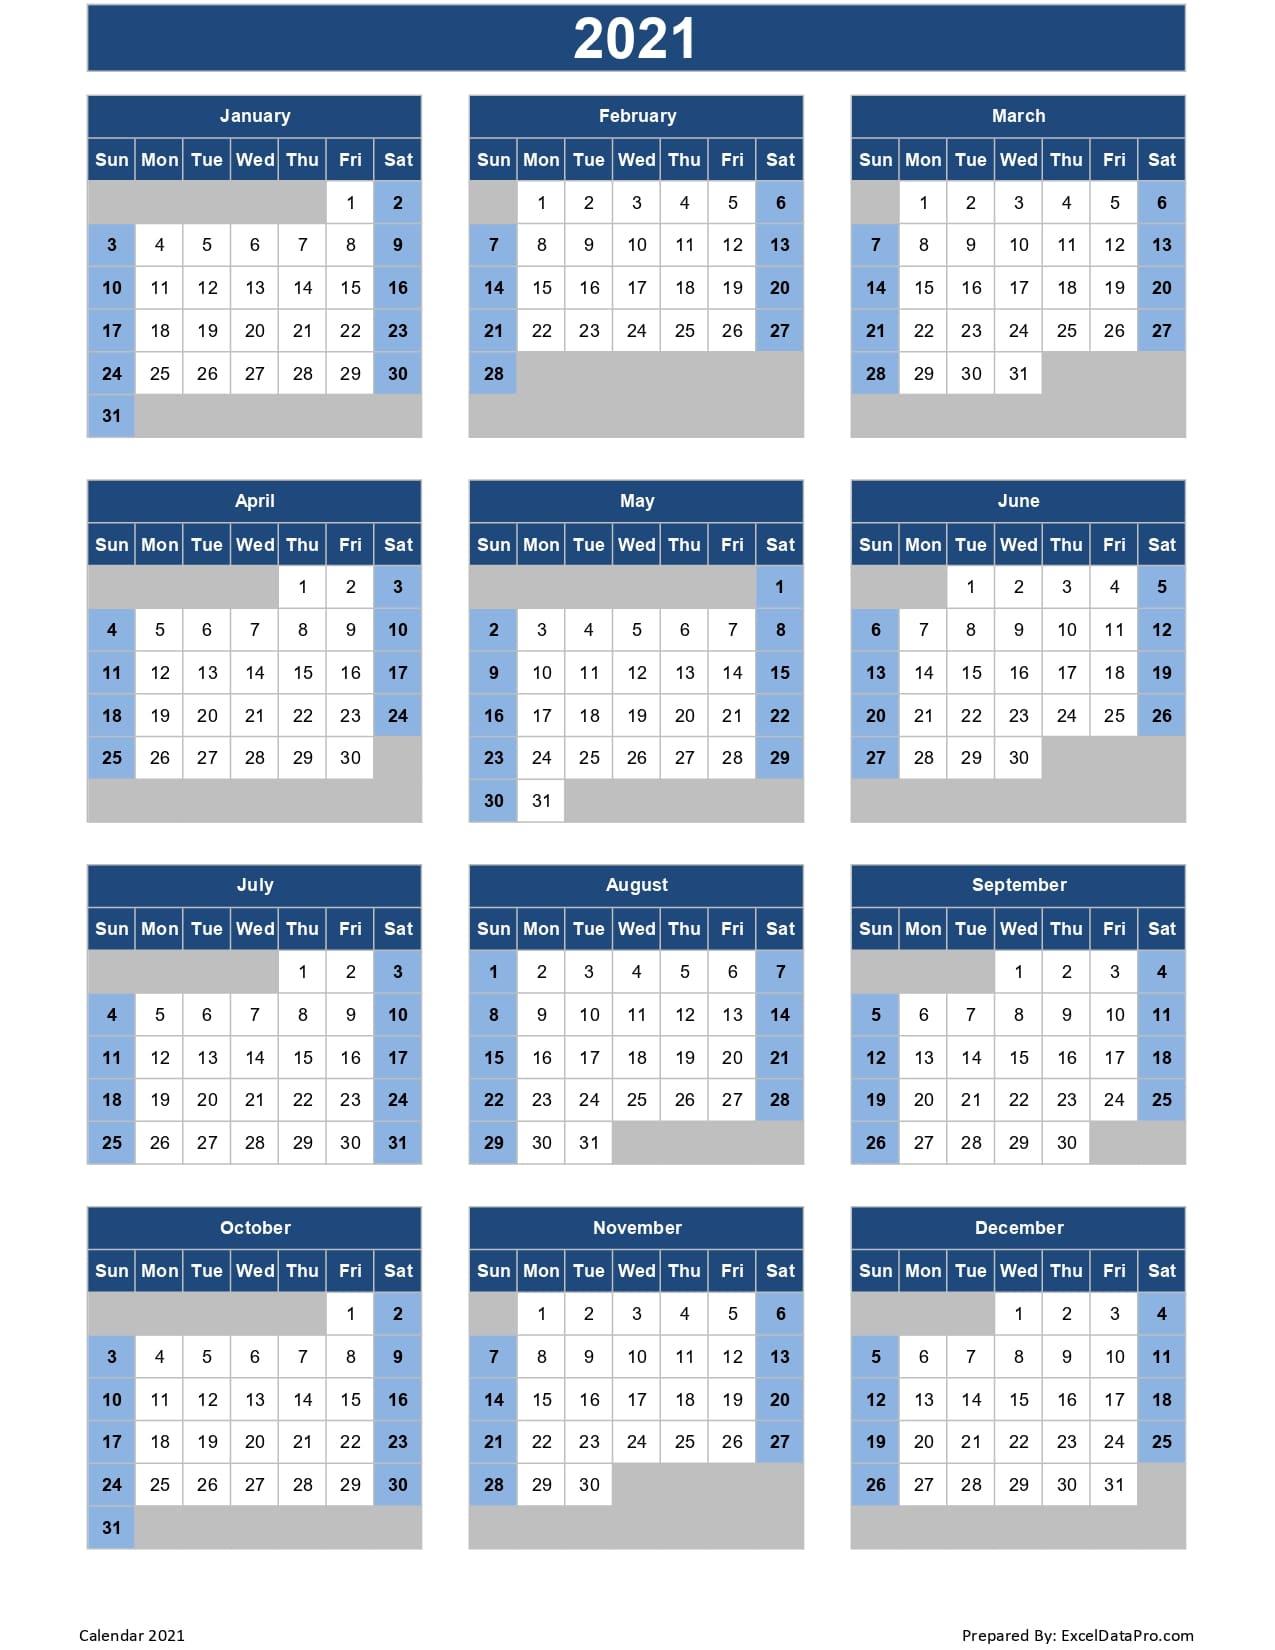 Calendar 2021 Excel Templates Printable Pdfs & Images